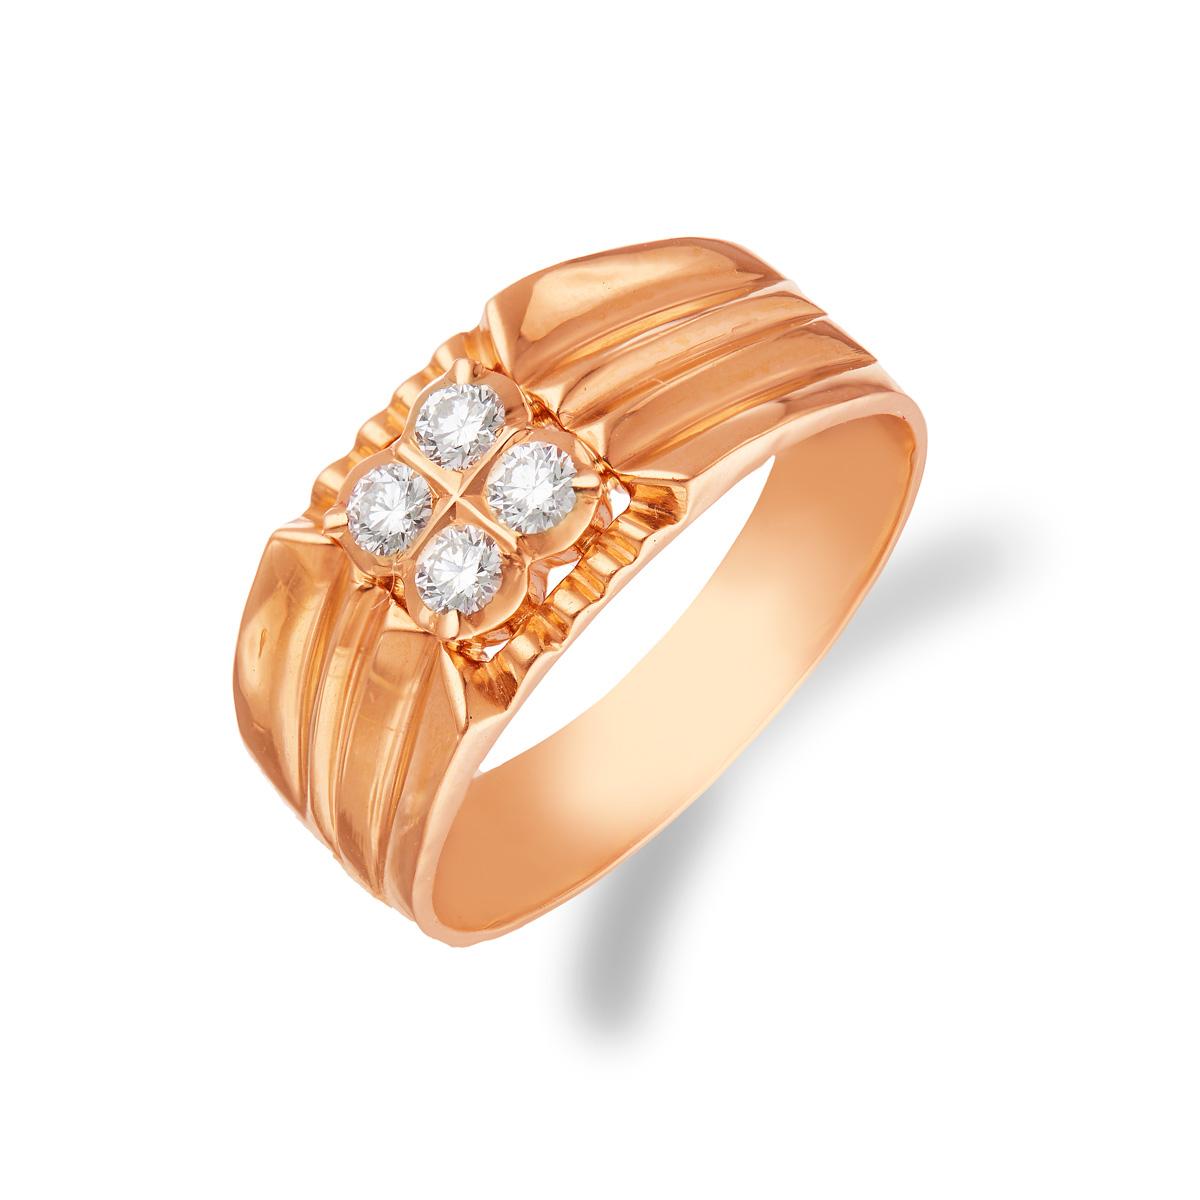 Classy Men's Ring